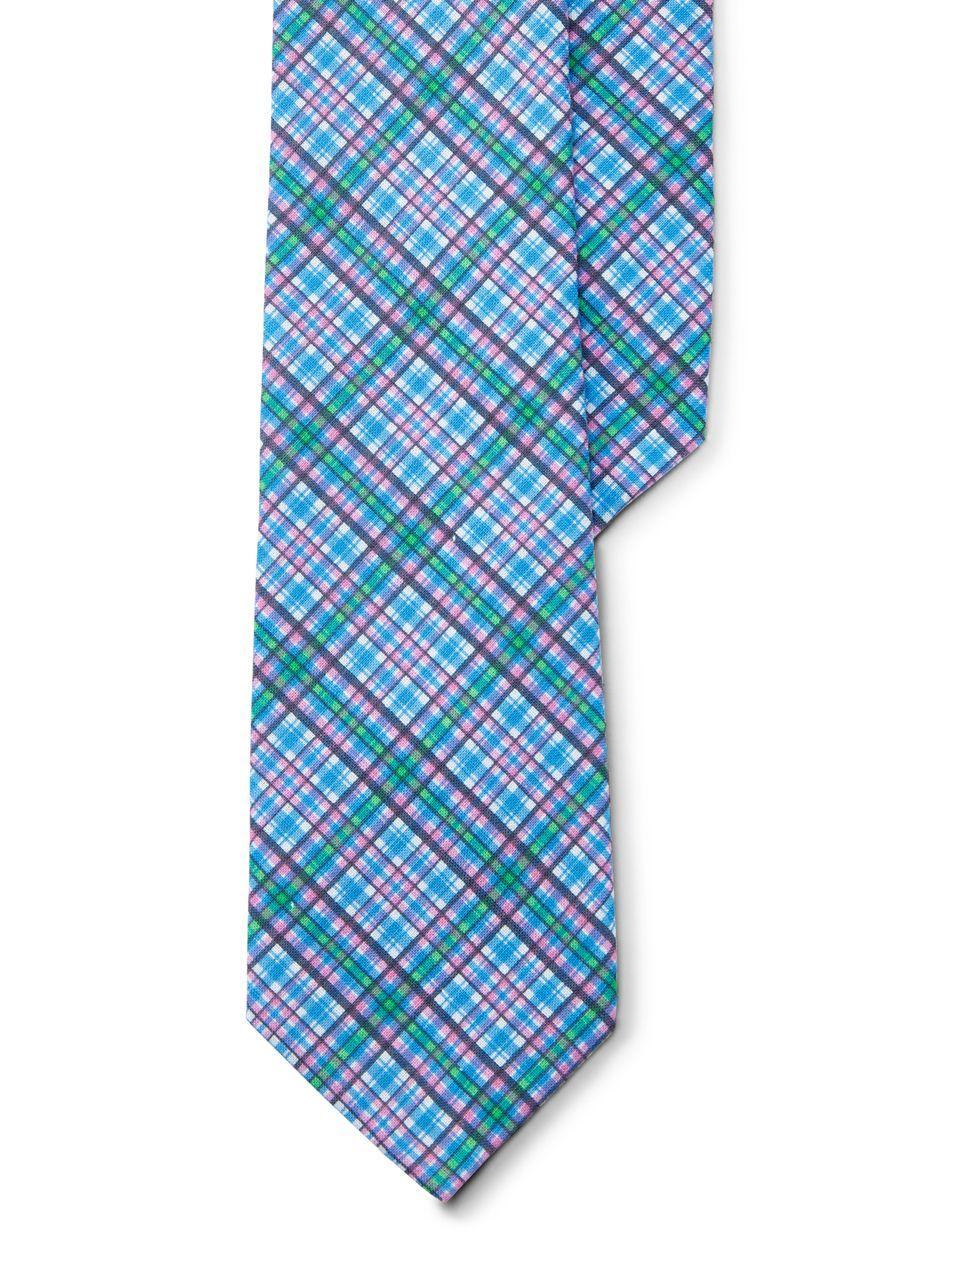 lyst lauren by ralph lauren plaid cotton tie in blue for men. Black Bedroom Furniture Sets. Home Design Ideas